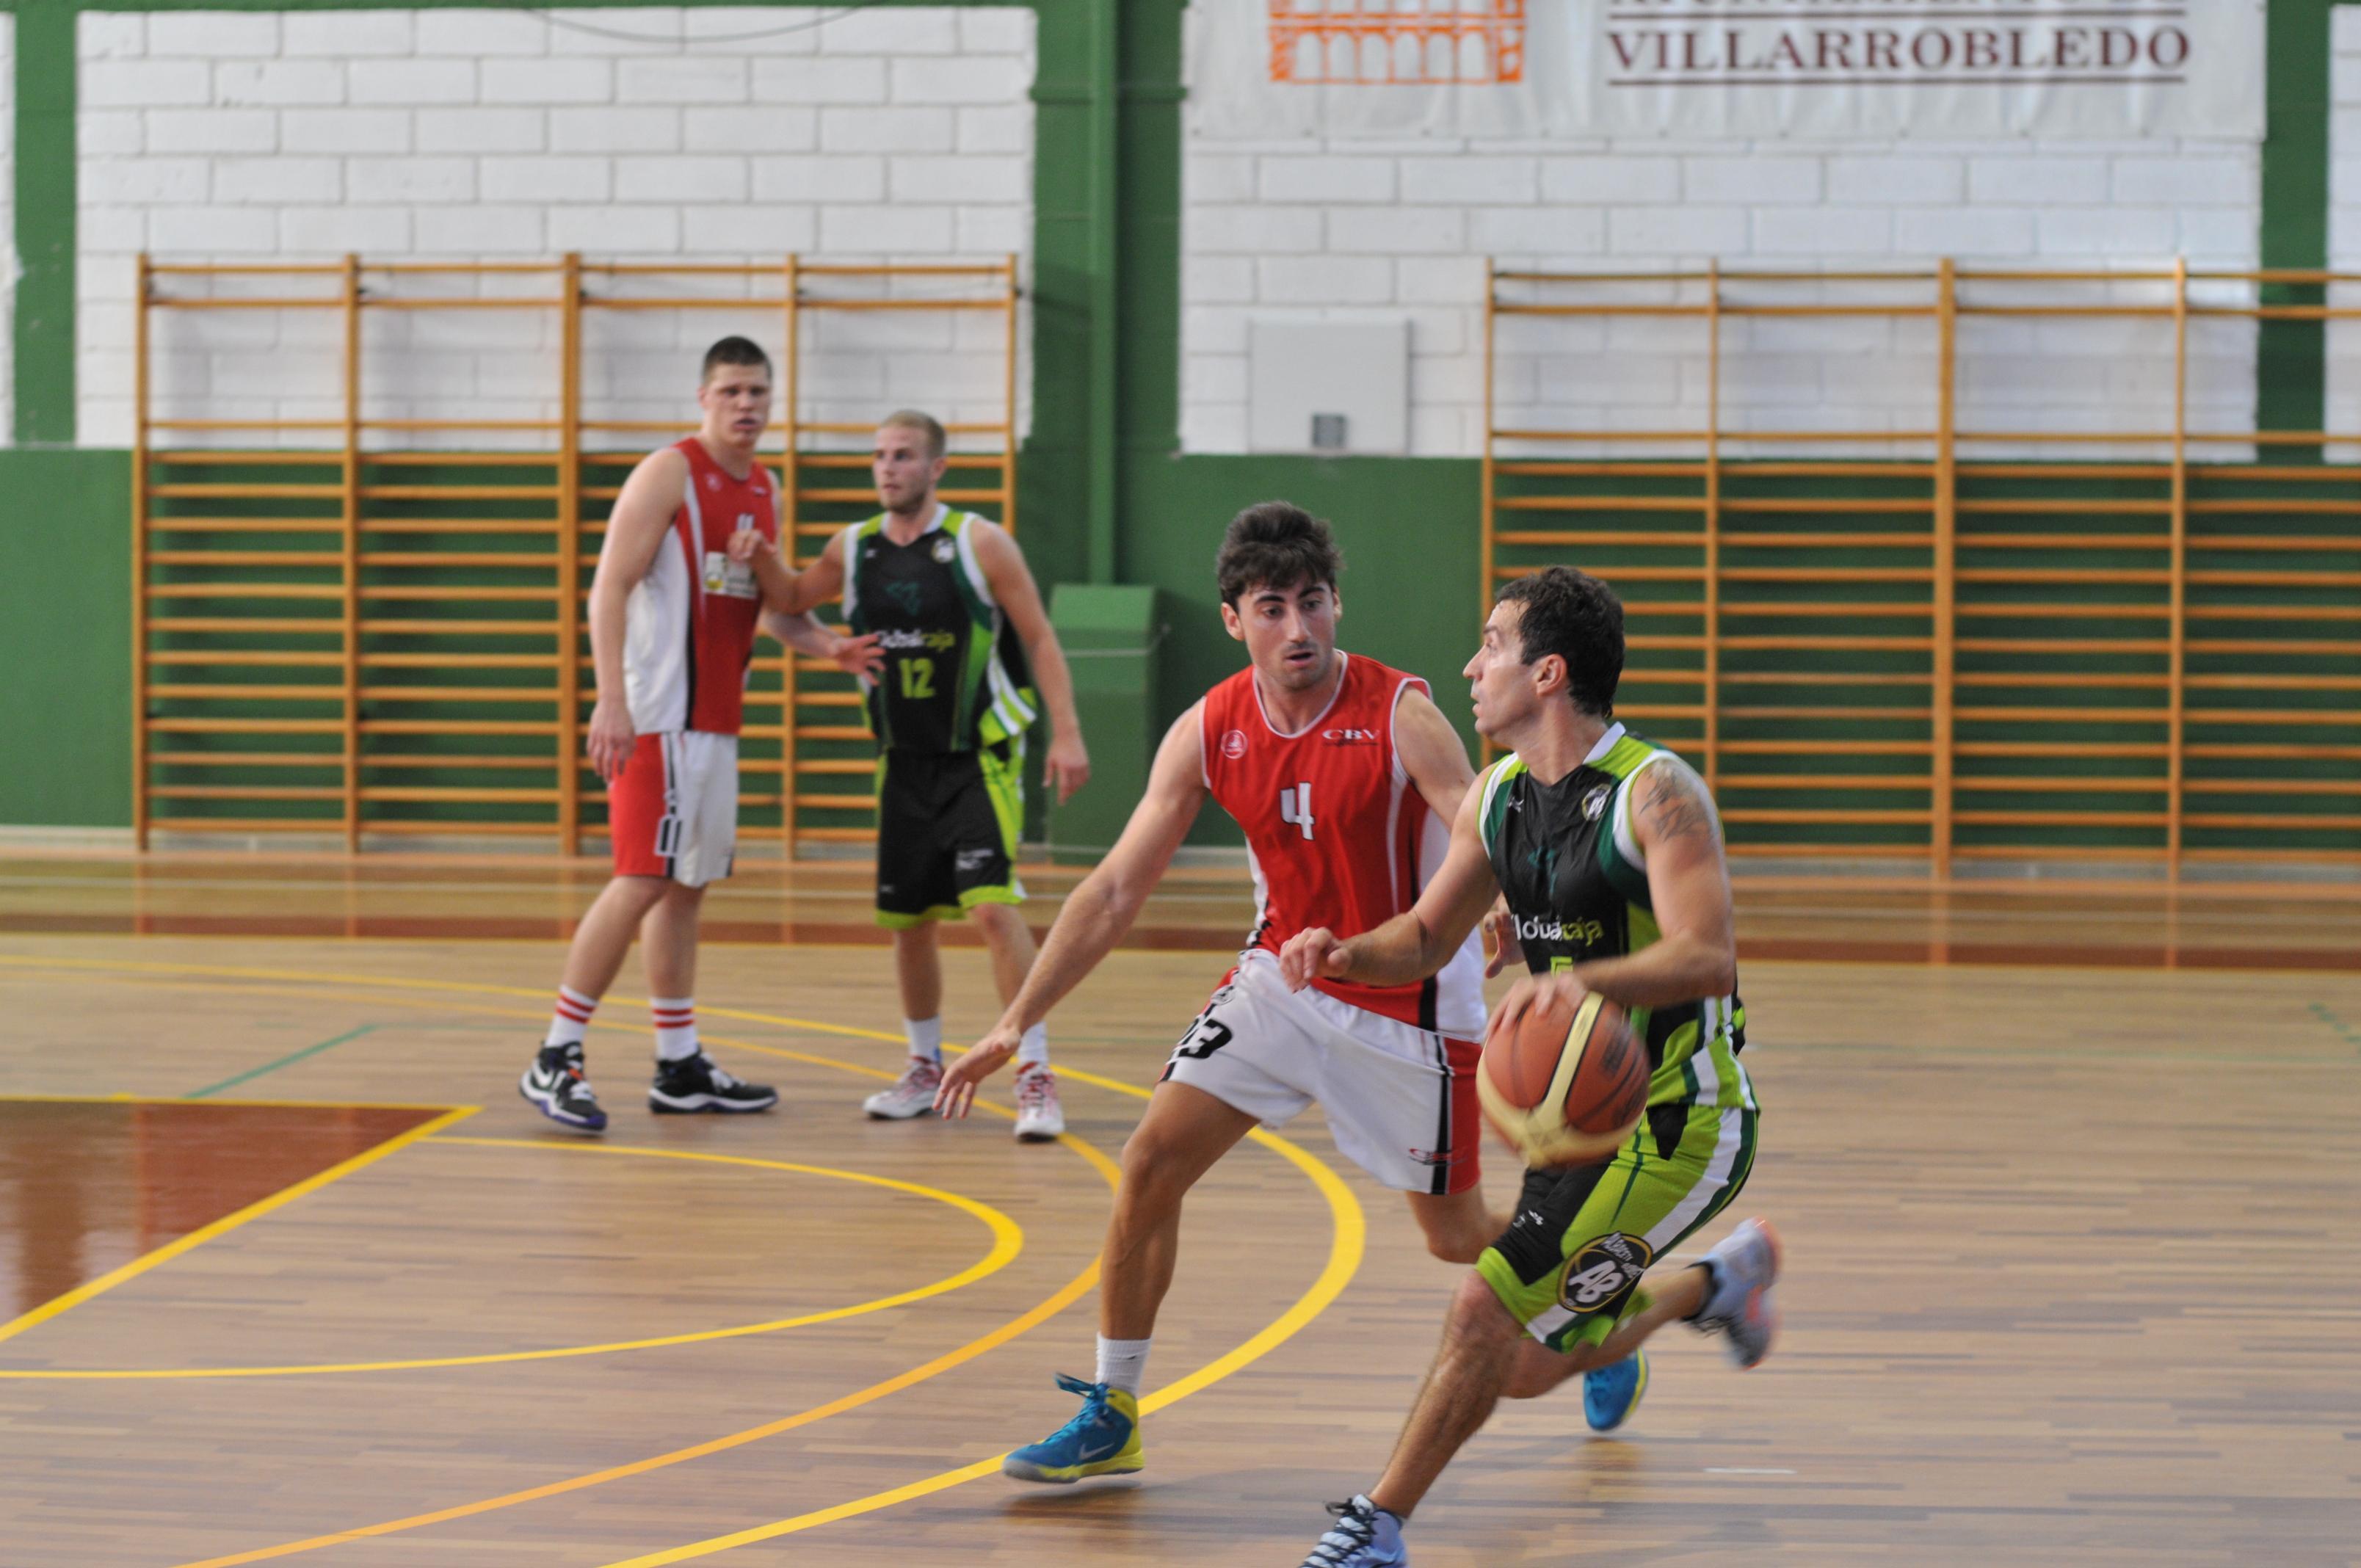 CB Villarrobledo - Albacete Basket